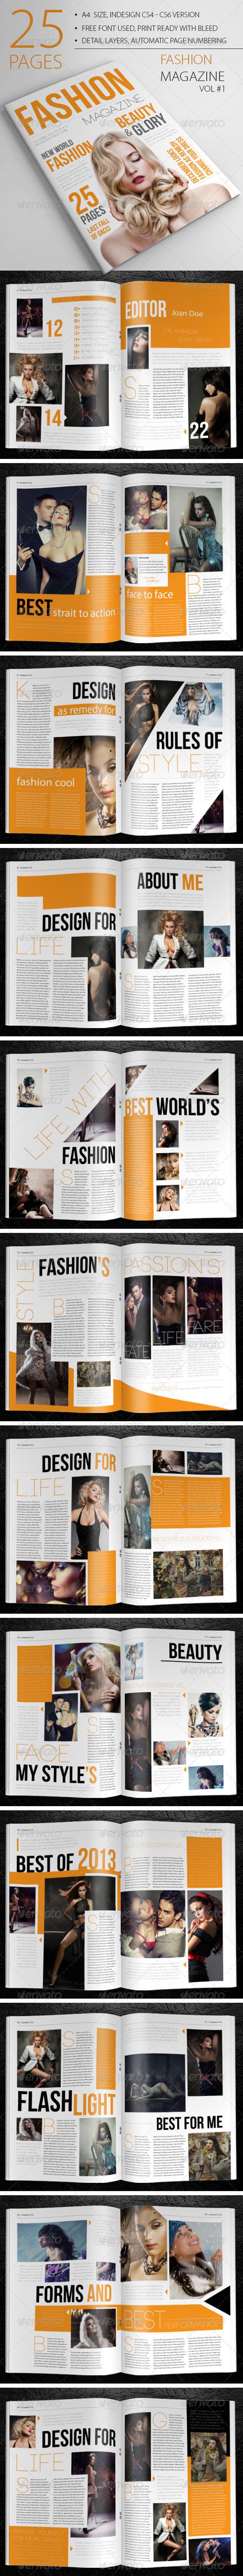 25 Pages Fashion Magazine Vol1 - Magazines Print Templates